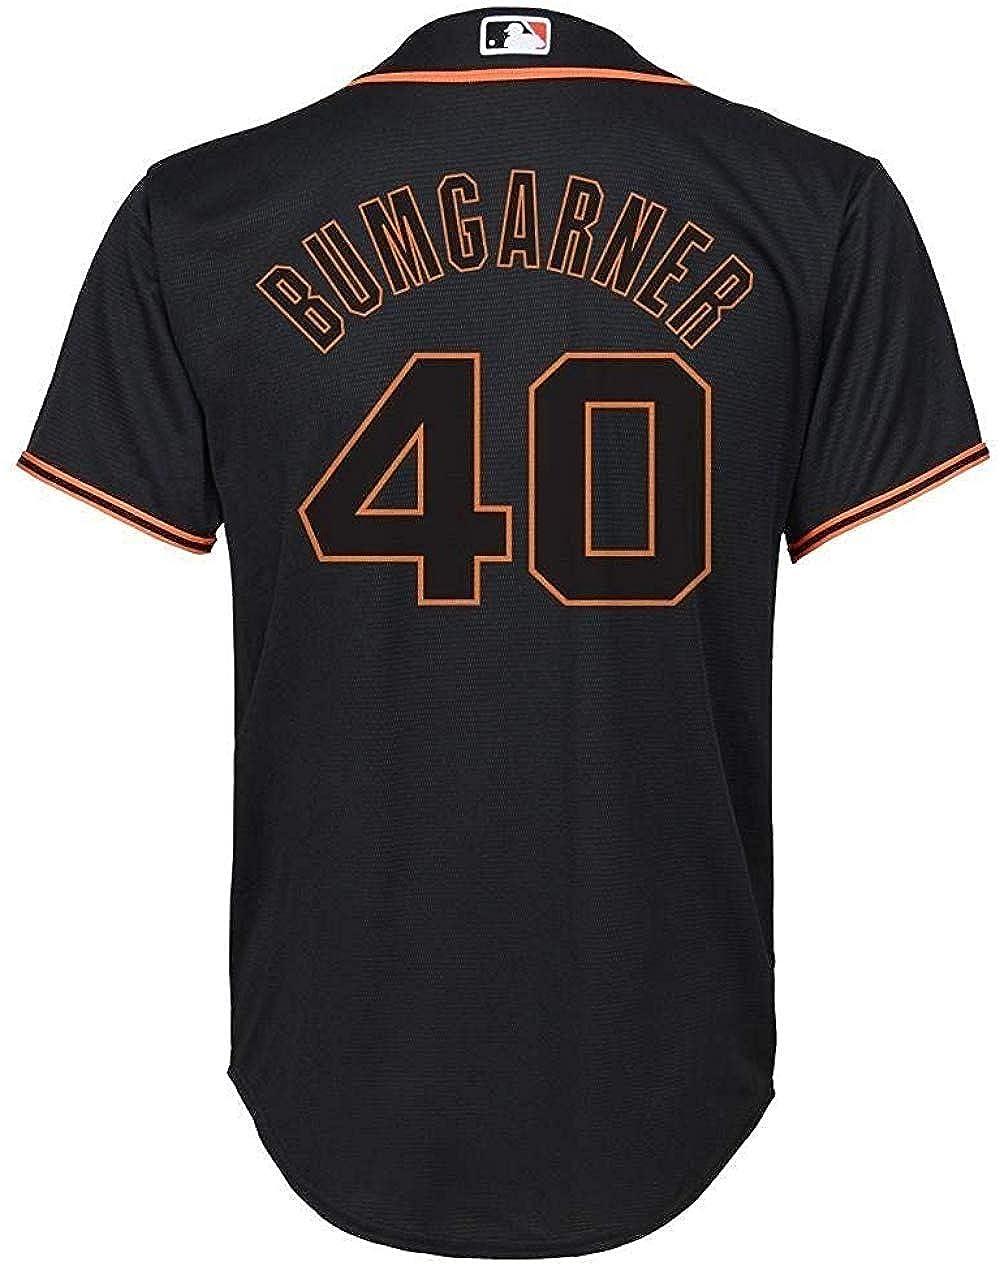 Madison Bumgarner San Francisco Giants MLB Boys Youth 8-20 Black Alternate Cool Base Replica Jersey